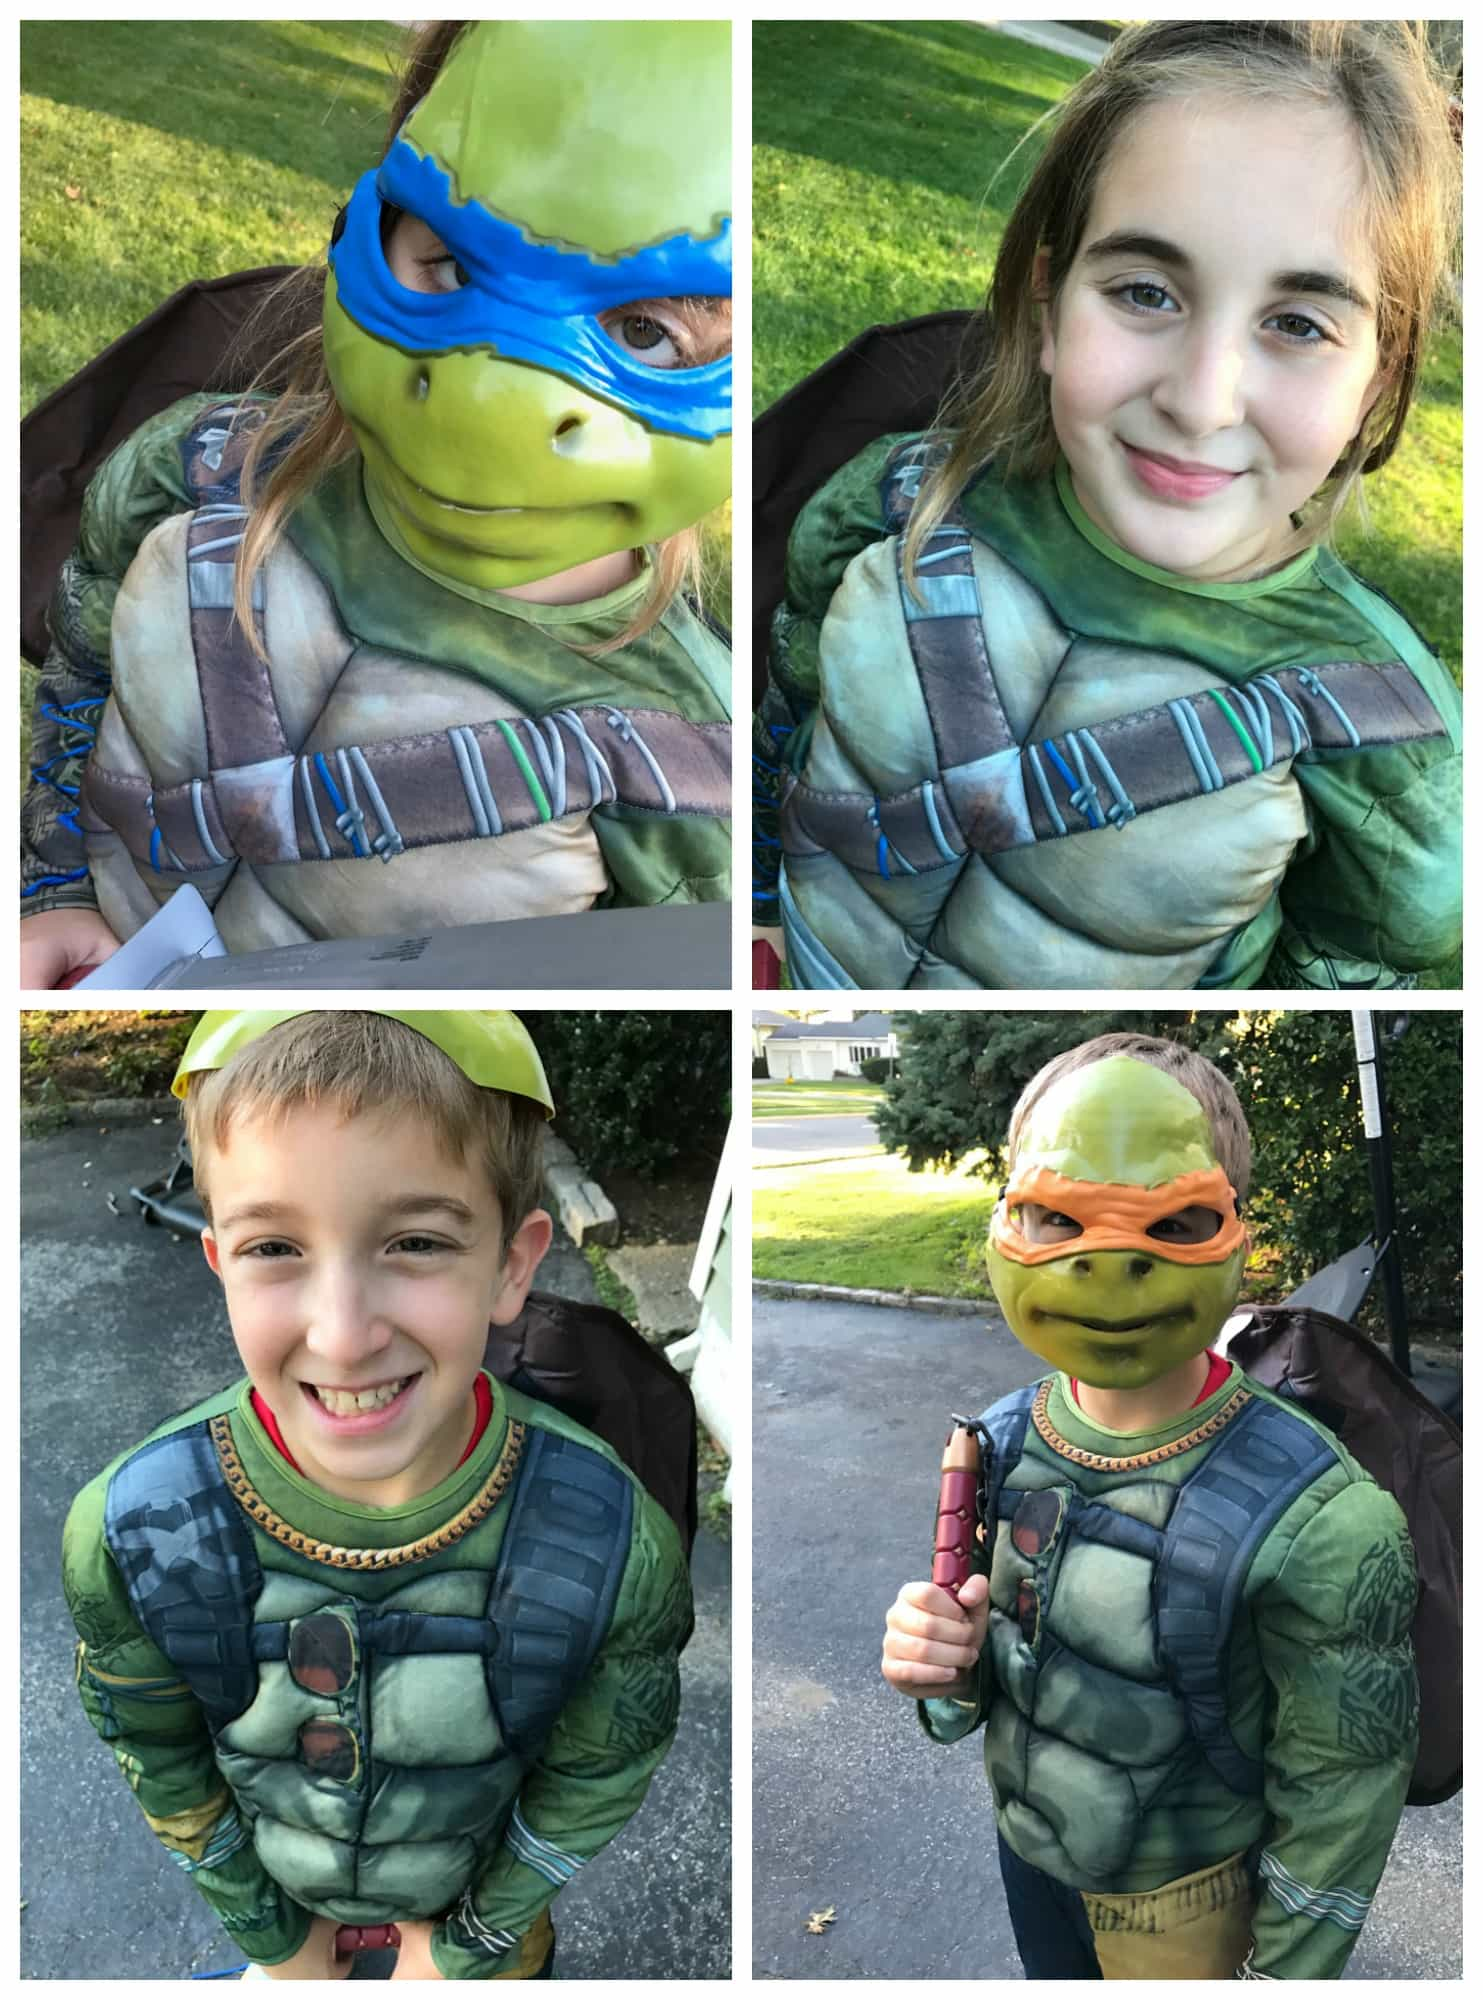 teenage mutant ninja turtle halloween costumes for everyone #target